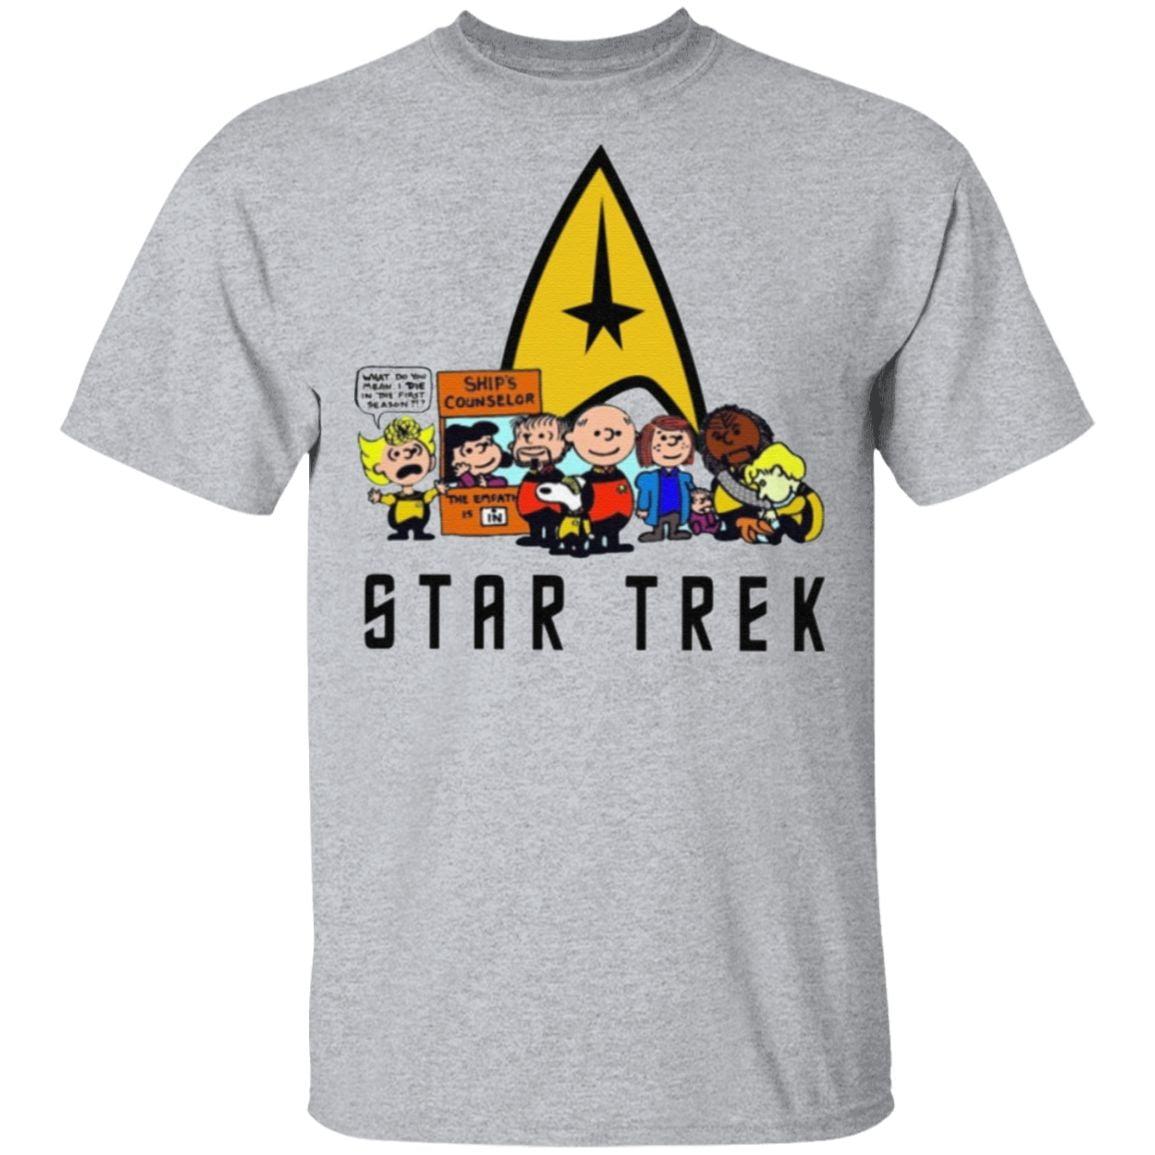 The Peanuts Characters Cartoon Star Trek T Shirt